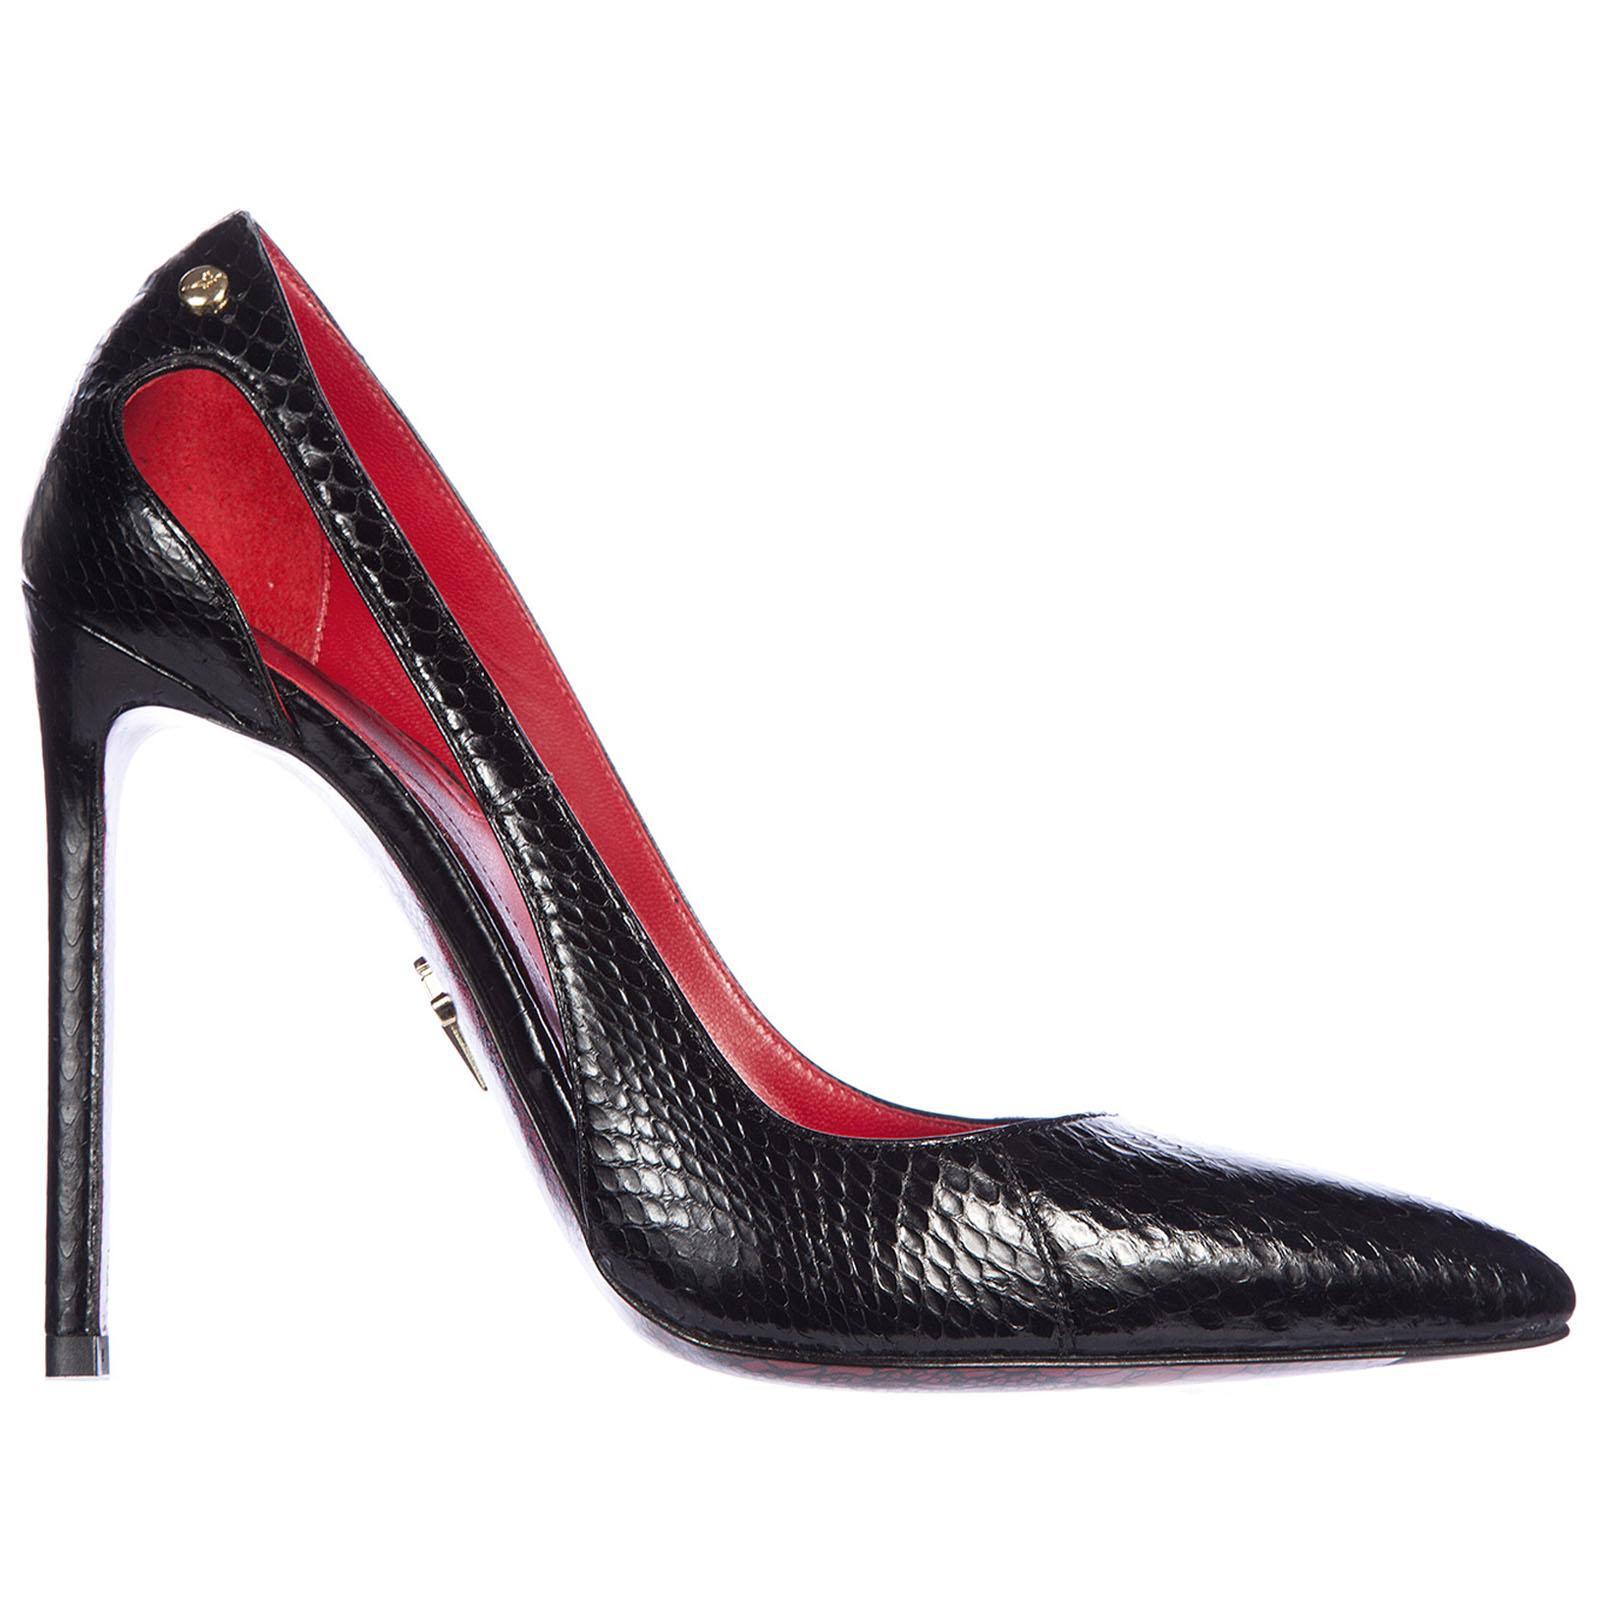 Decolletes decoltè scarpe donna con tacco pelle ayer